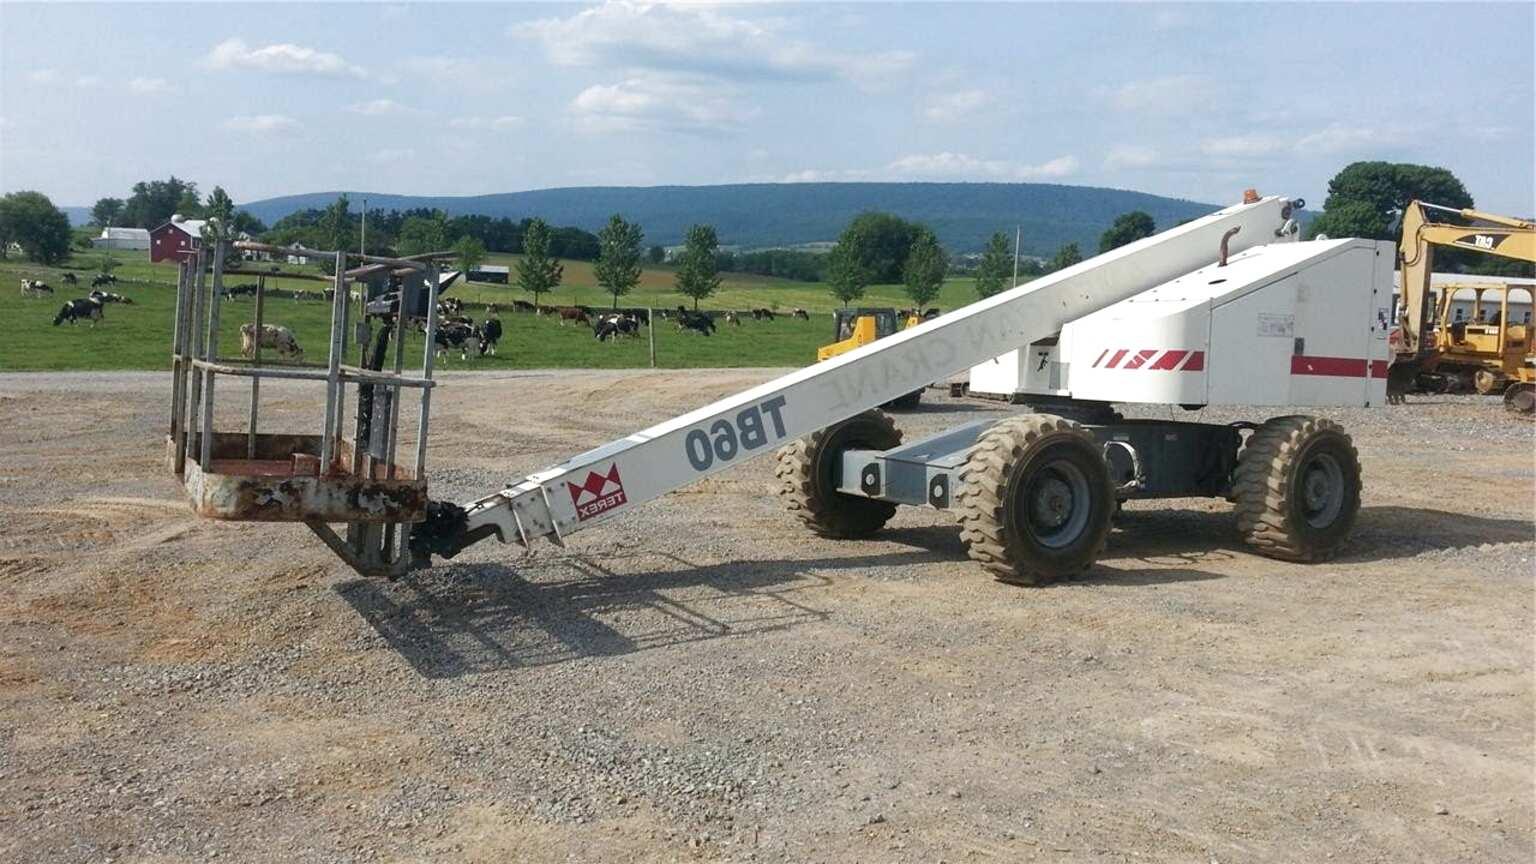 terex lift for sale